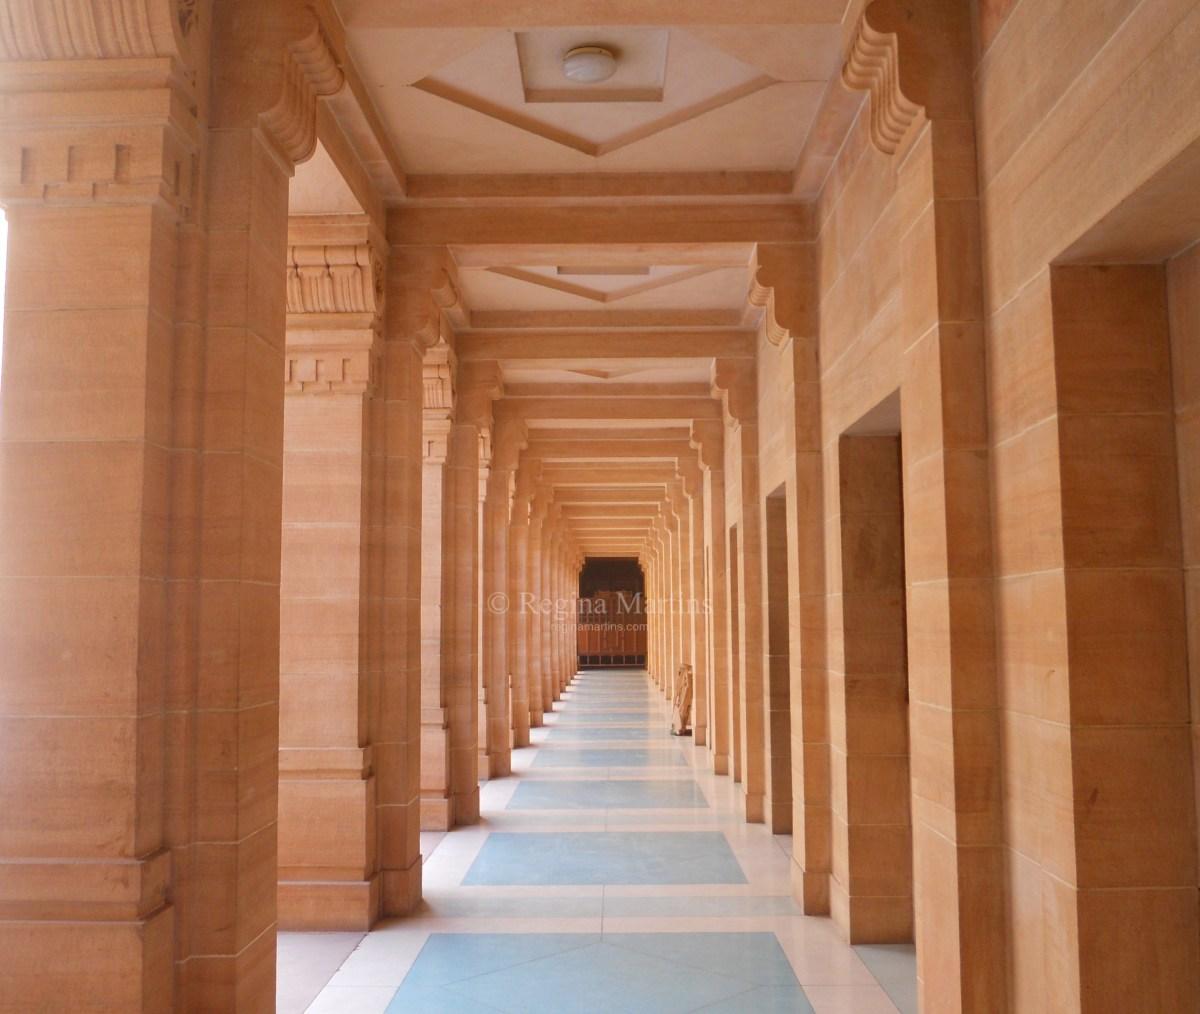 Wordpress Weekly Photo: Symmetry - India